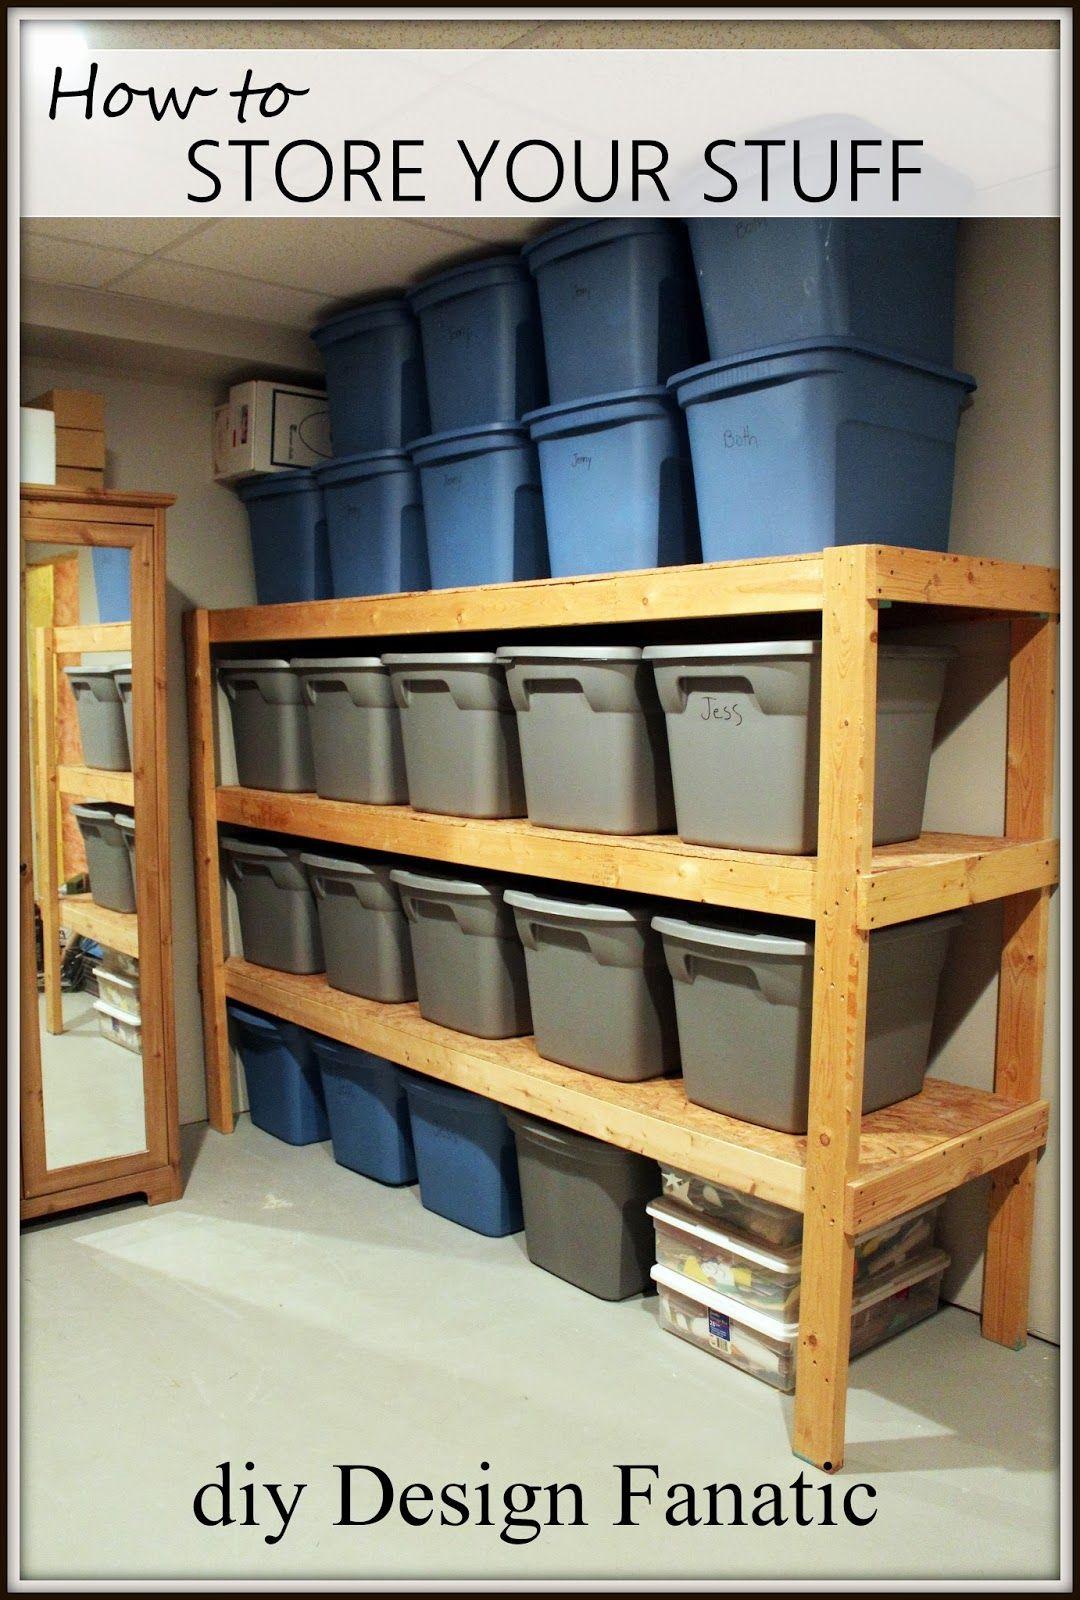 DIY STORAGE HOW TO STORE YOUR STUFF Diy storage shelves